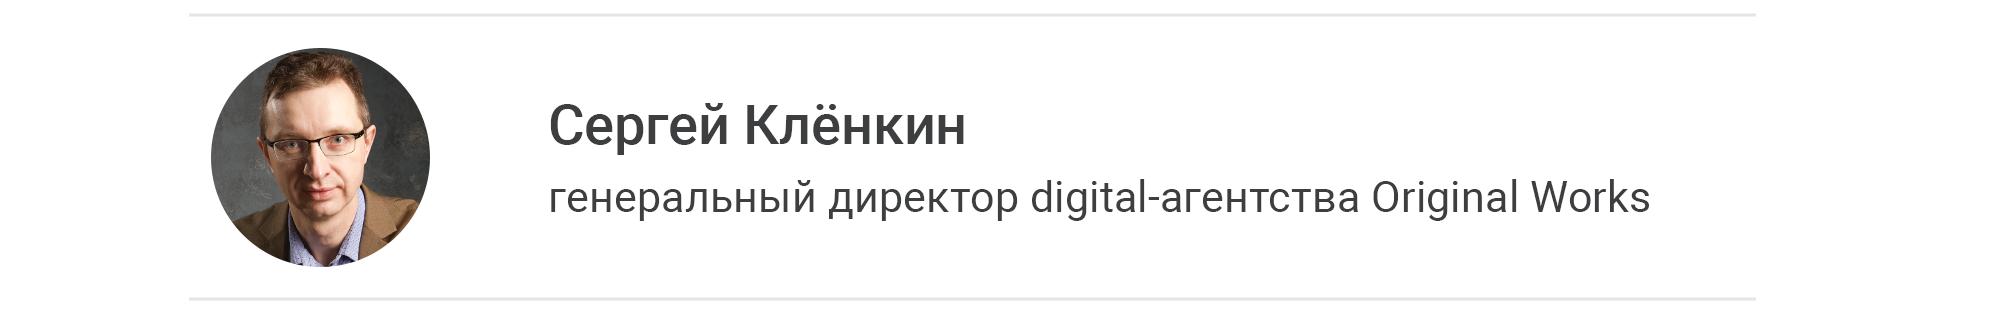 Сергей Клёнкин.png